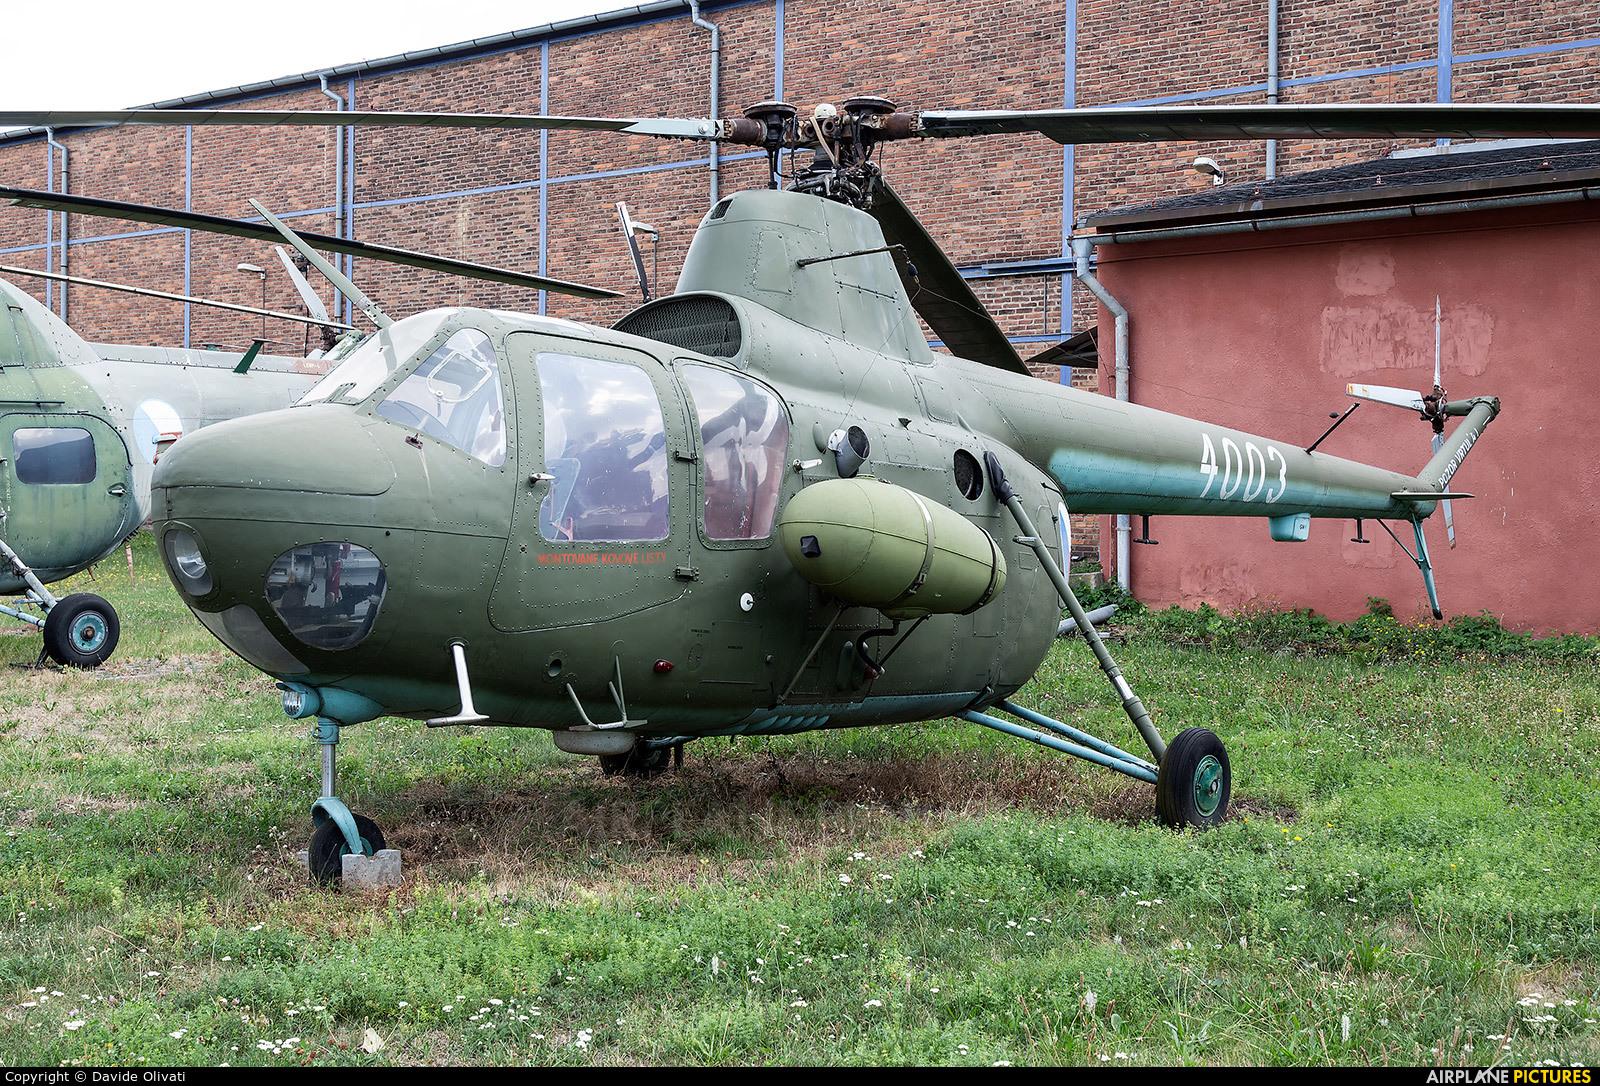 Czechoslovak - Air Force 4003 aircraft at Prague - Kbely, Letecké muzeum